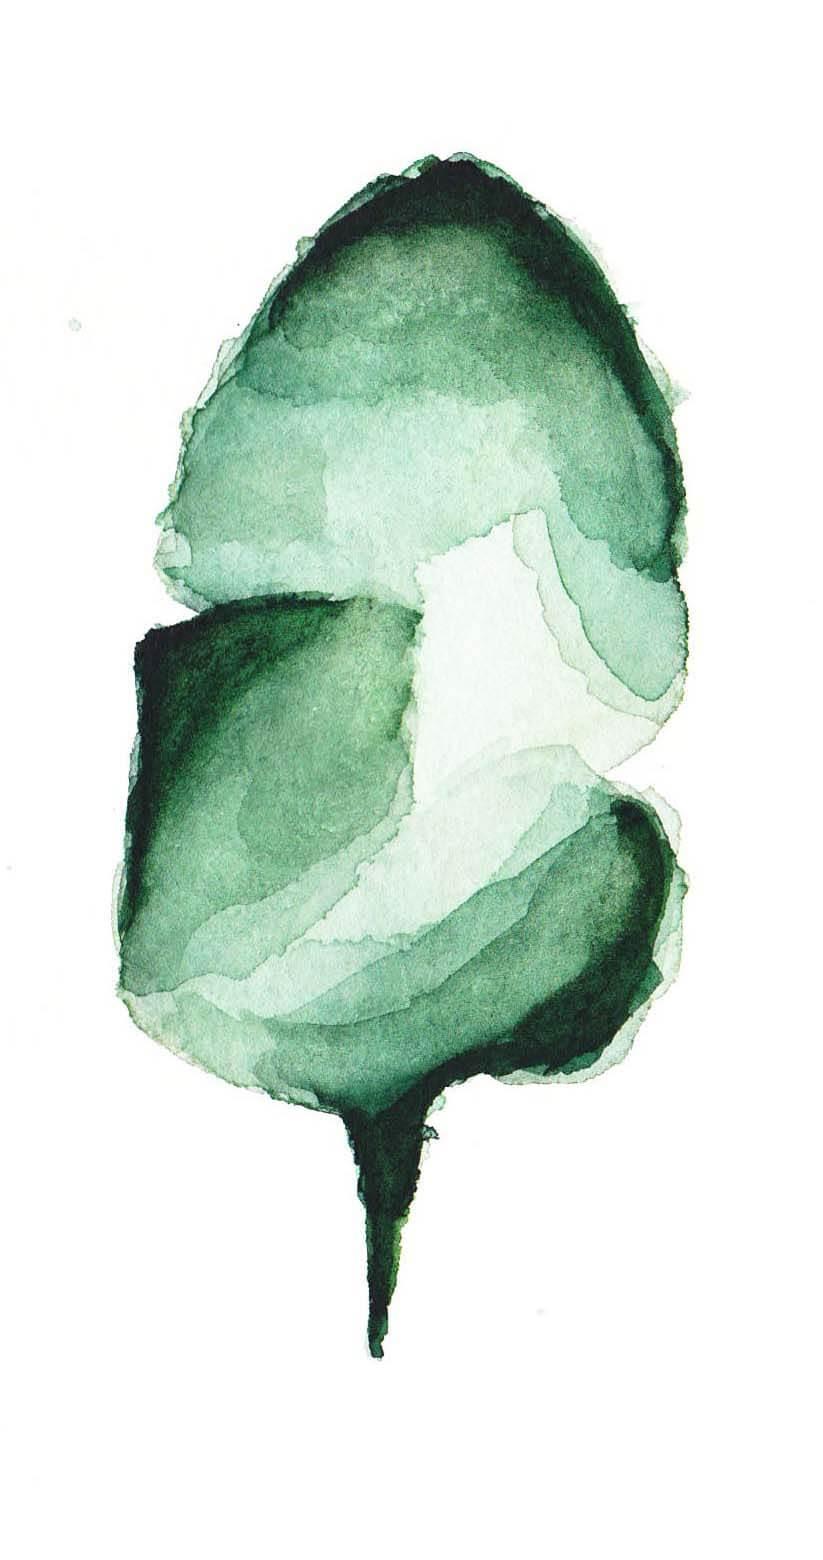 101_04_180717_watercolour leaf 2.jpg